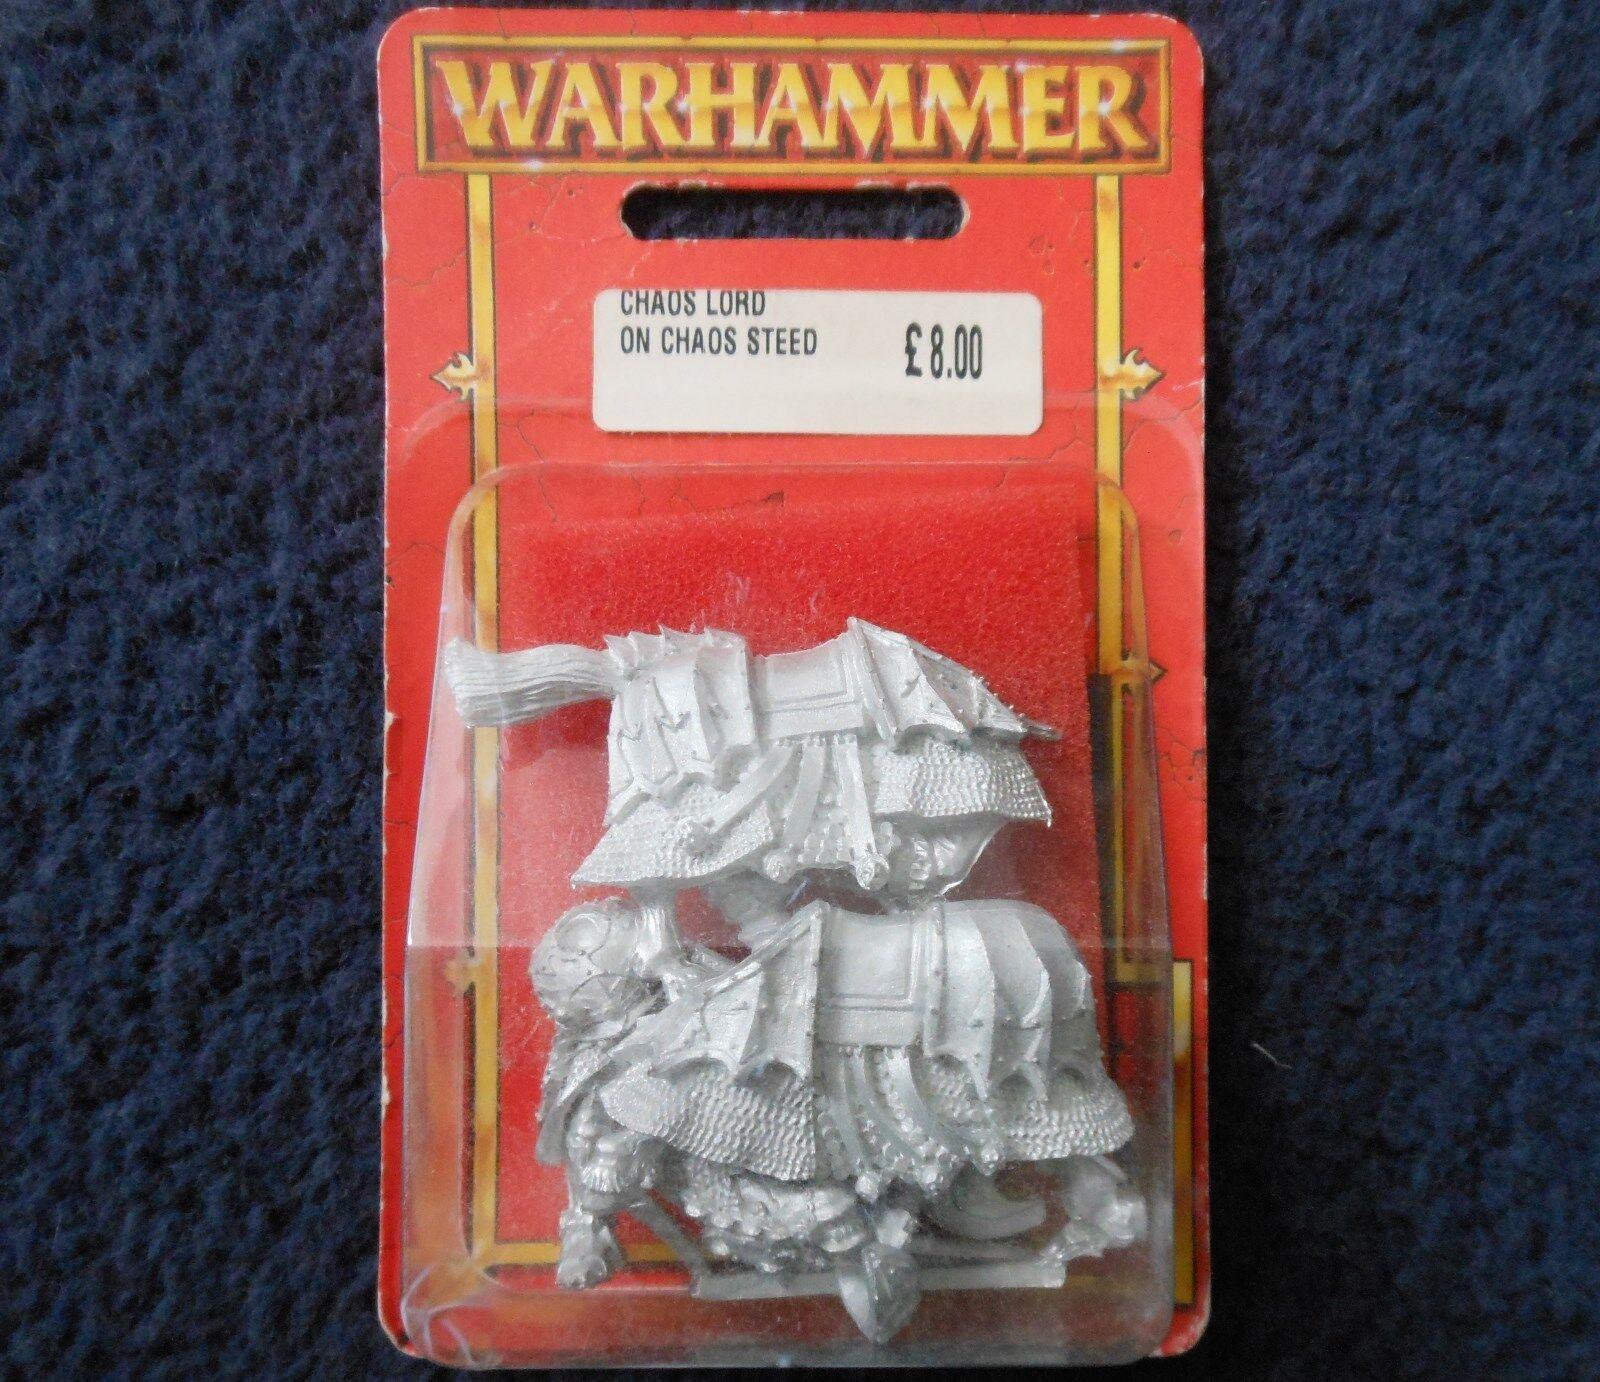 1998 Señor Caos en corcel Citadel Warhammer Guerreros Caos Montado caballería MIB GW